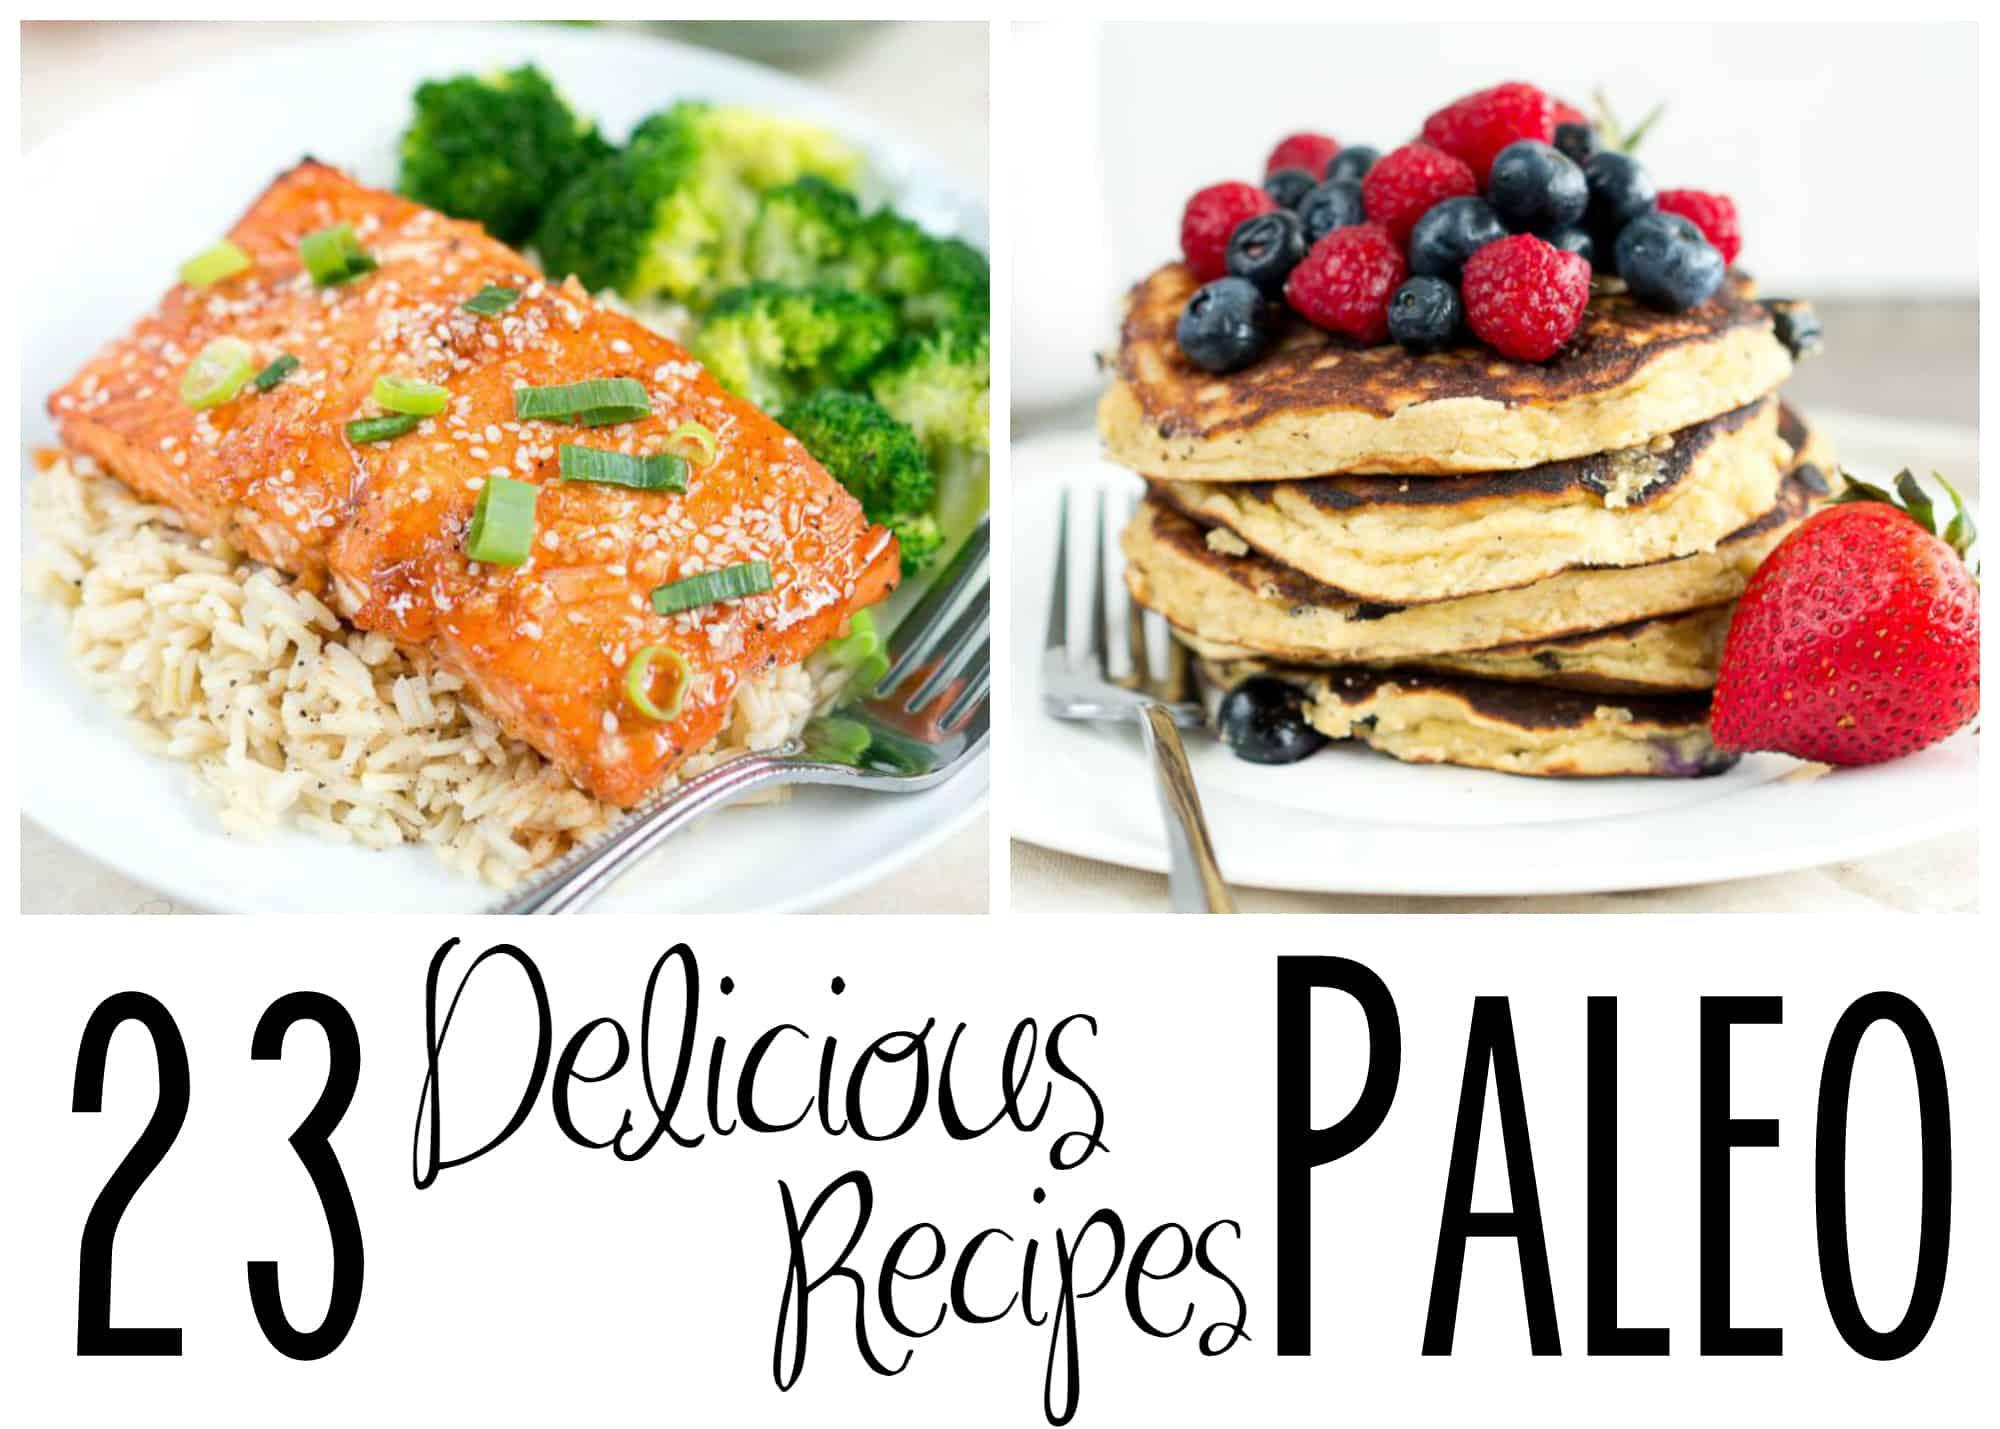 23 Delicious Paleo Recipes